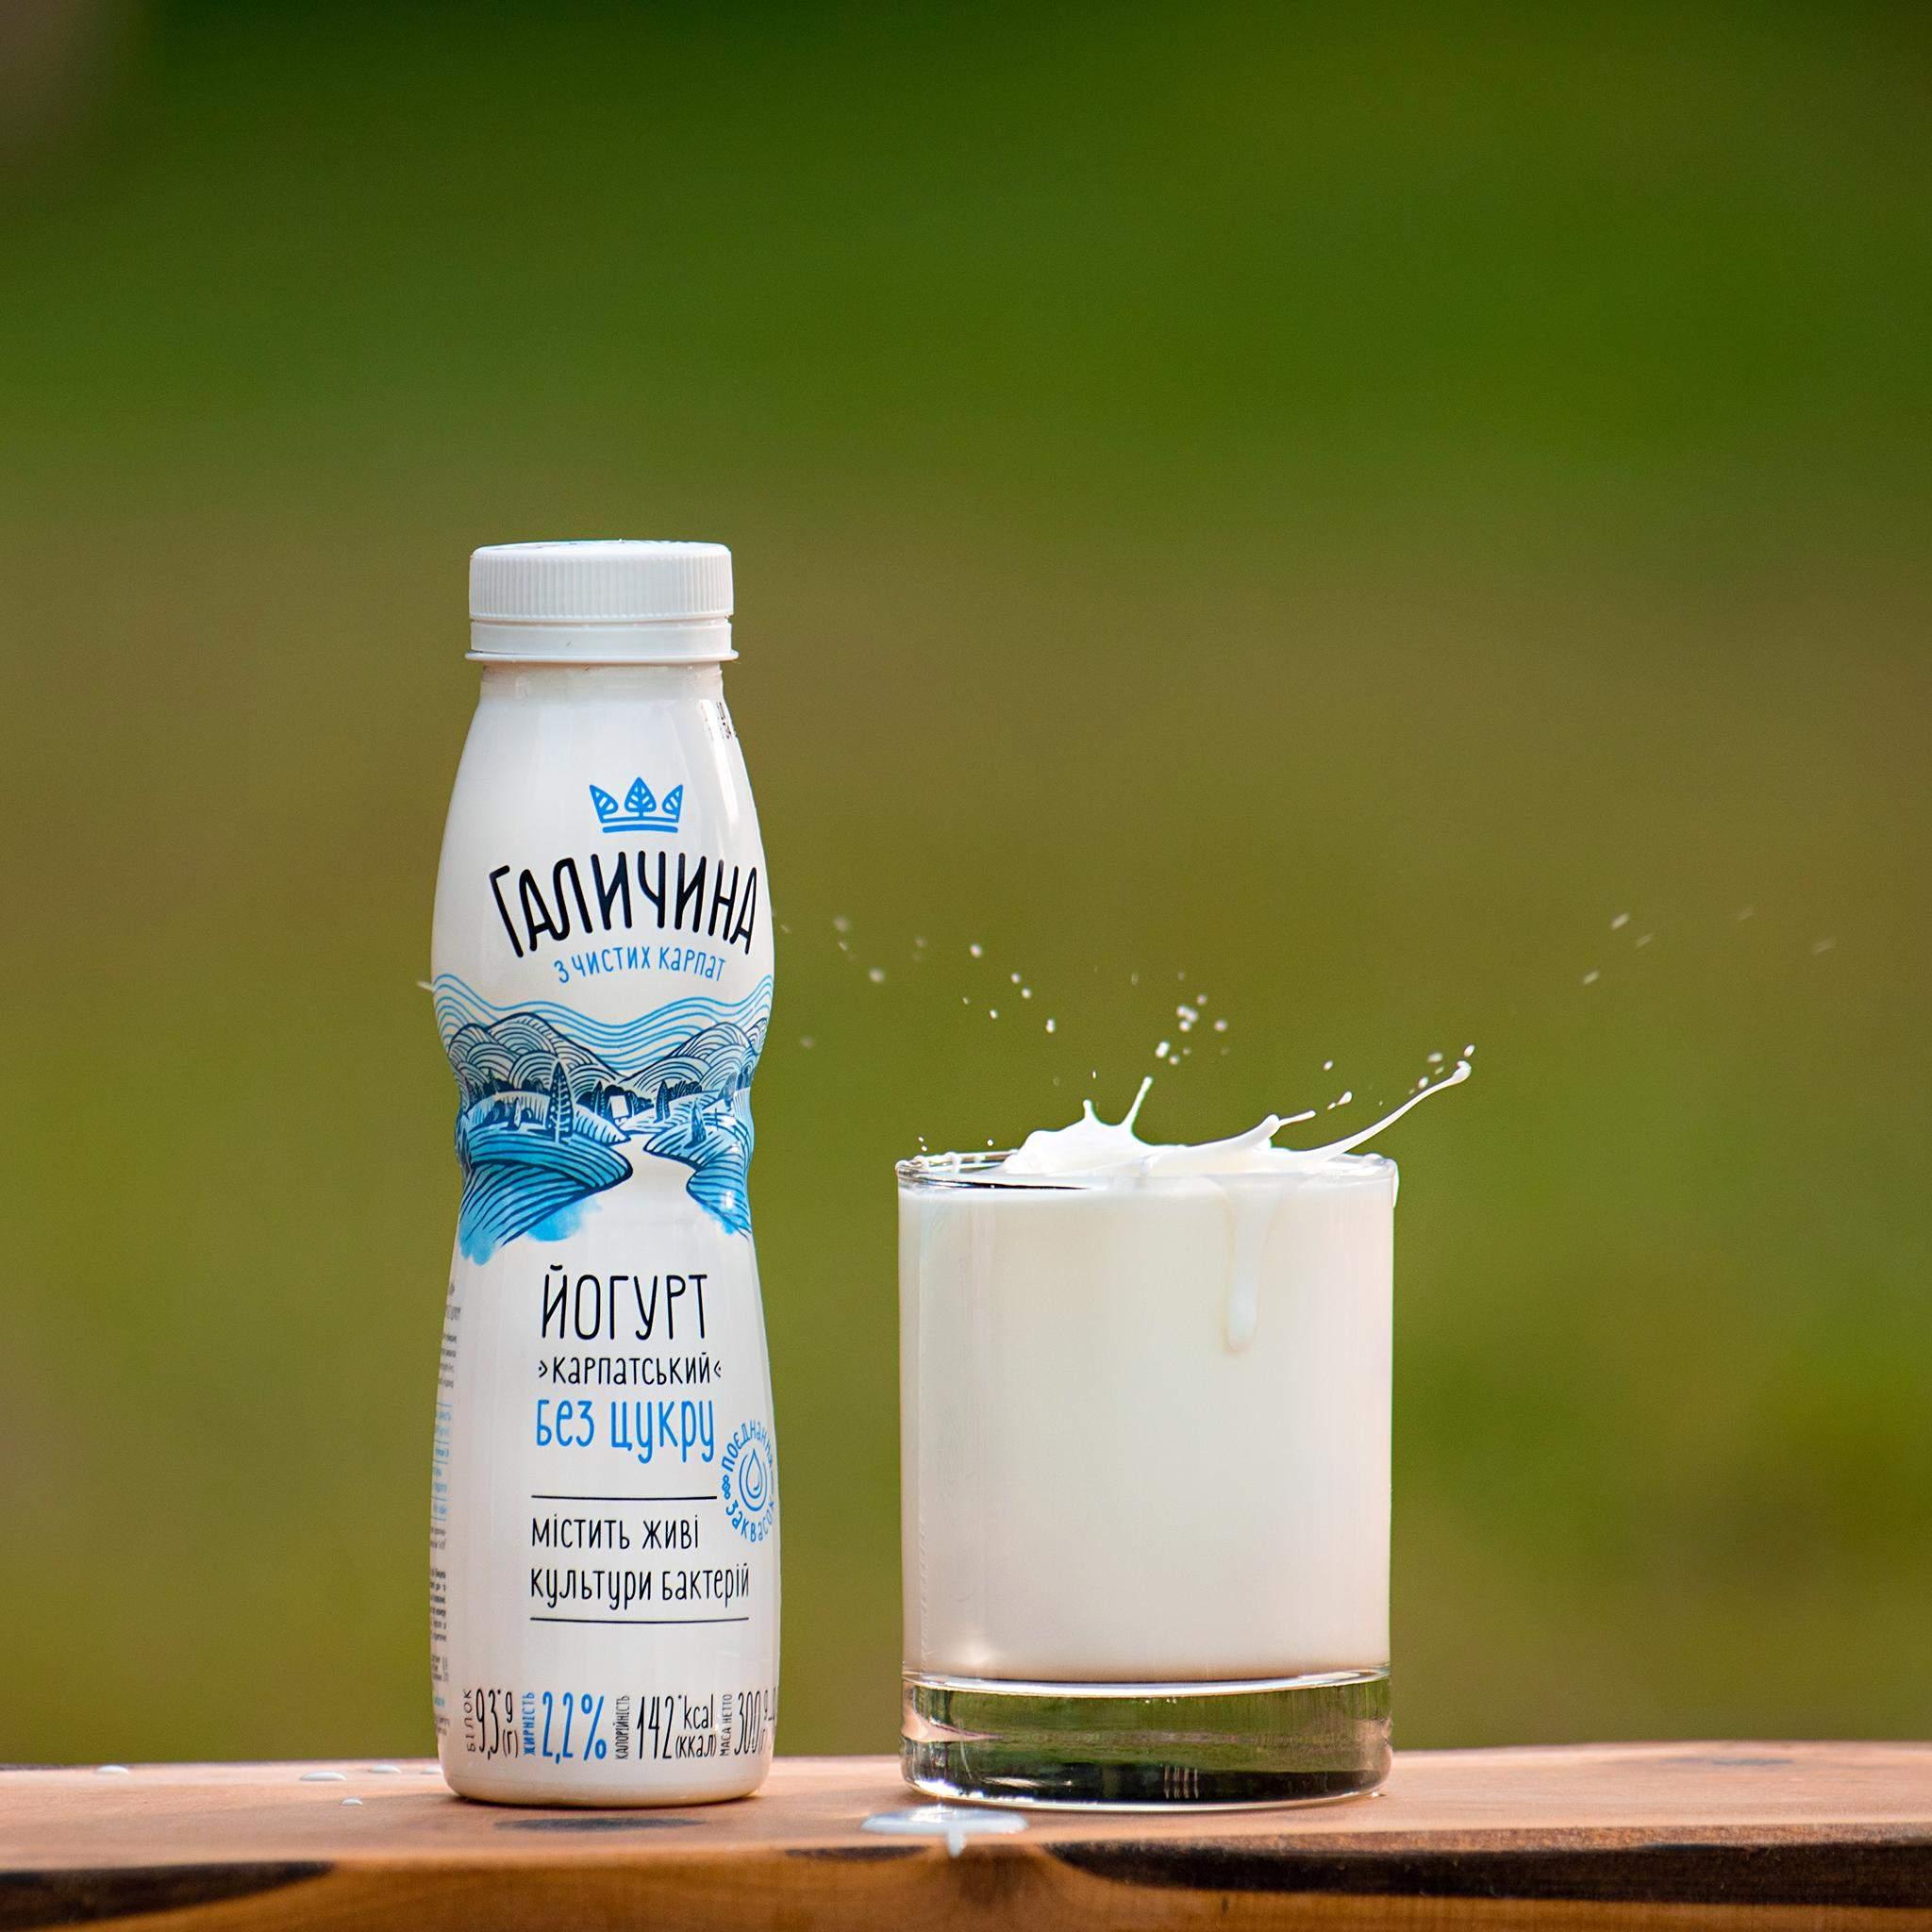 Карпатський йогурт